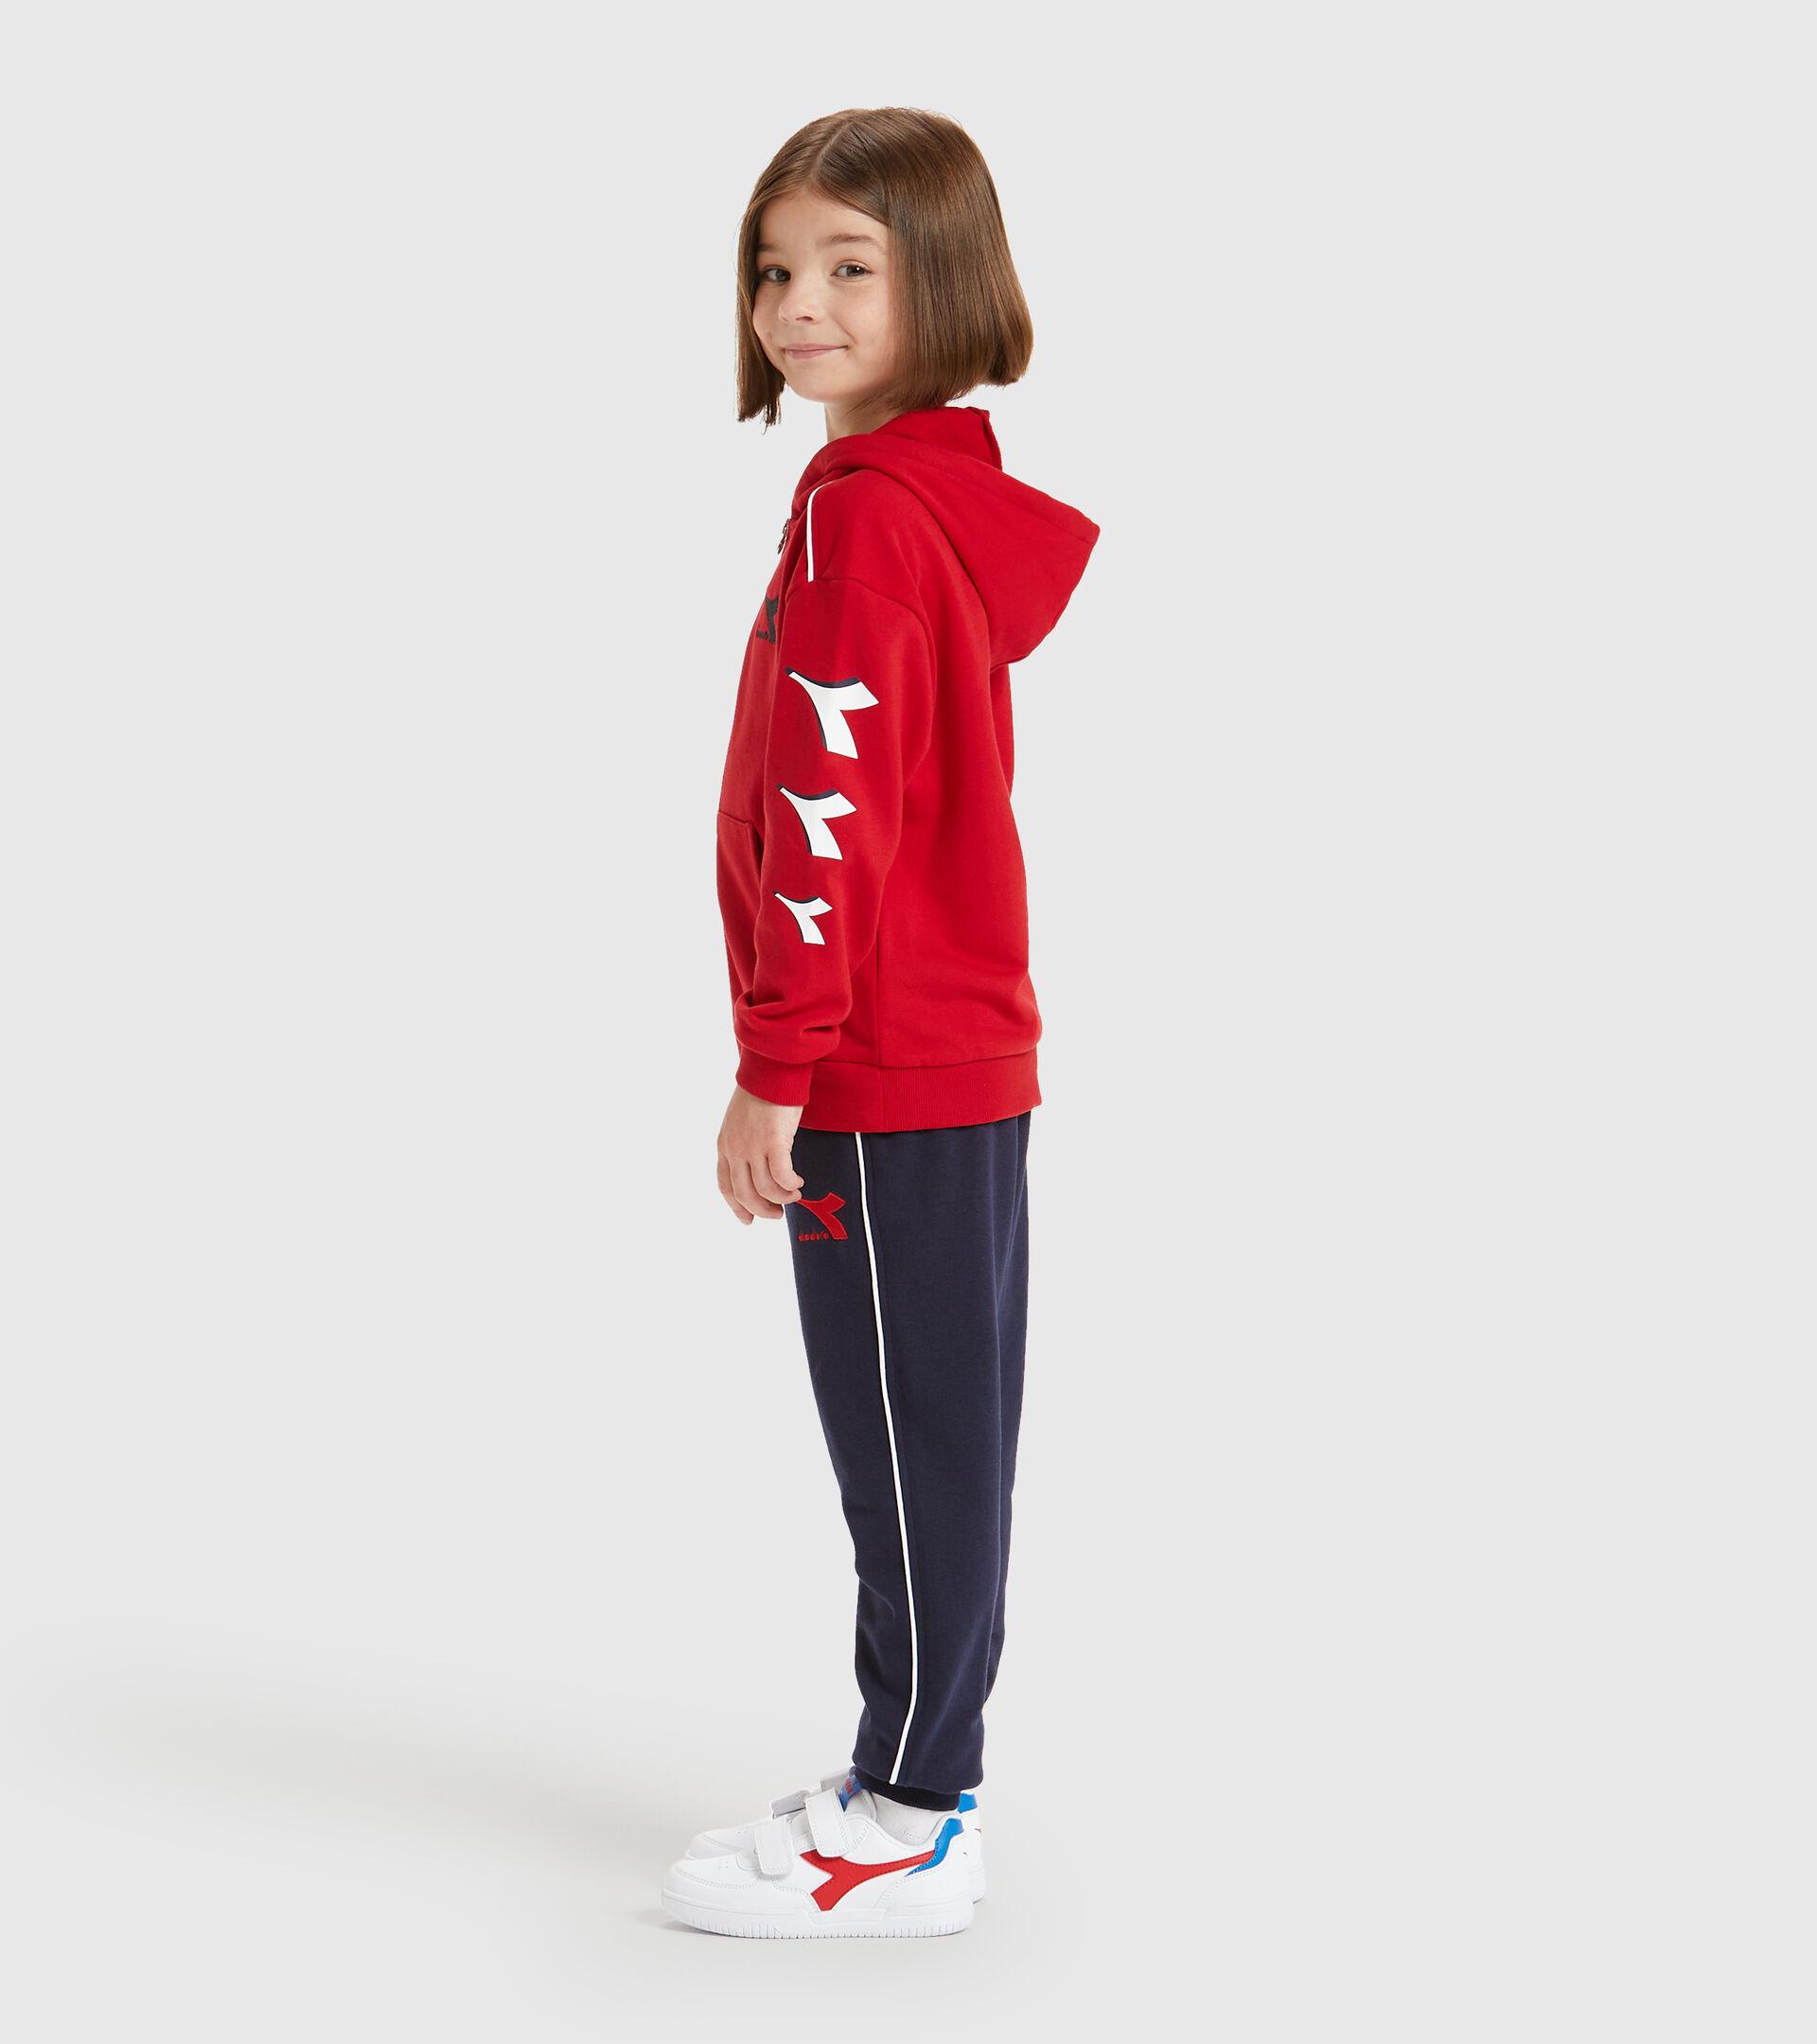 Tracksuit - Kids JU.HD FZ TRACKSUIT CUBIC TANGO RED - Diadora